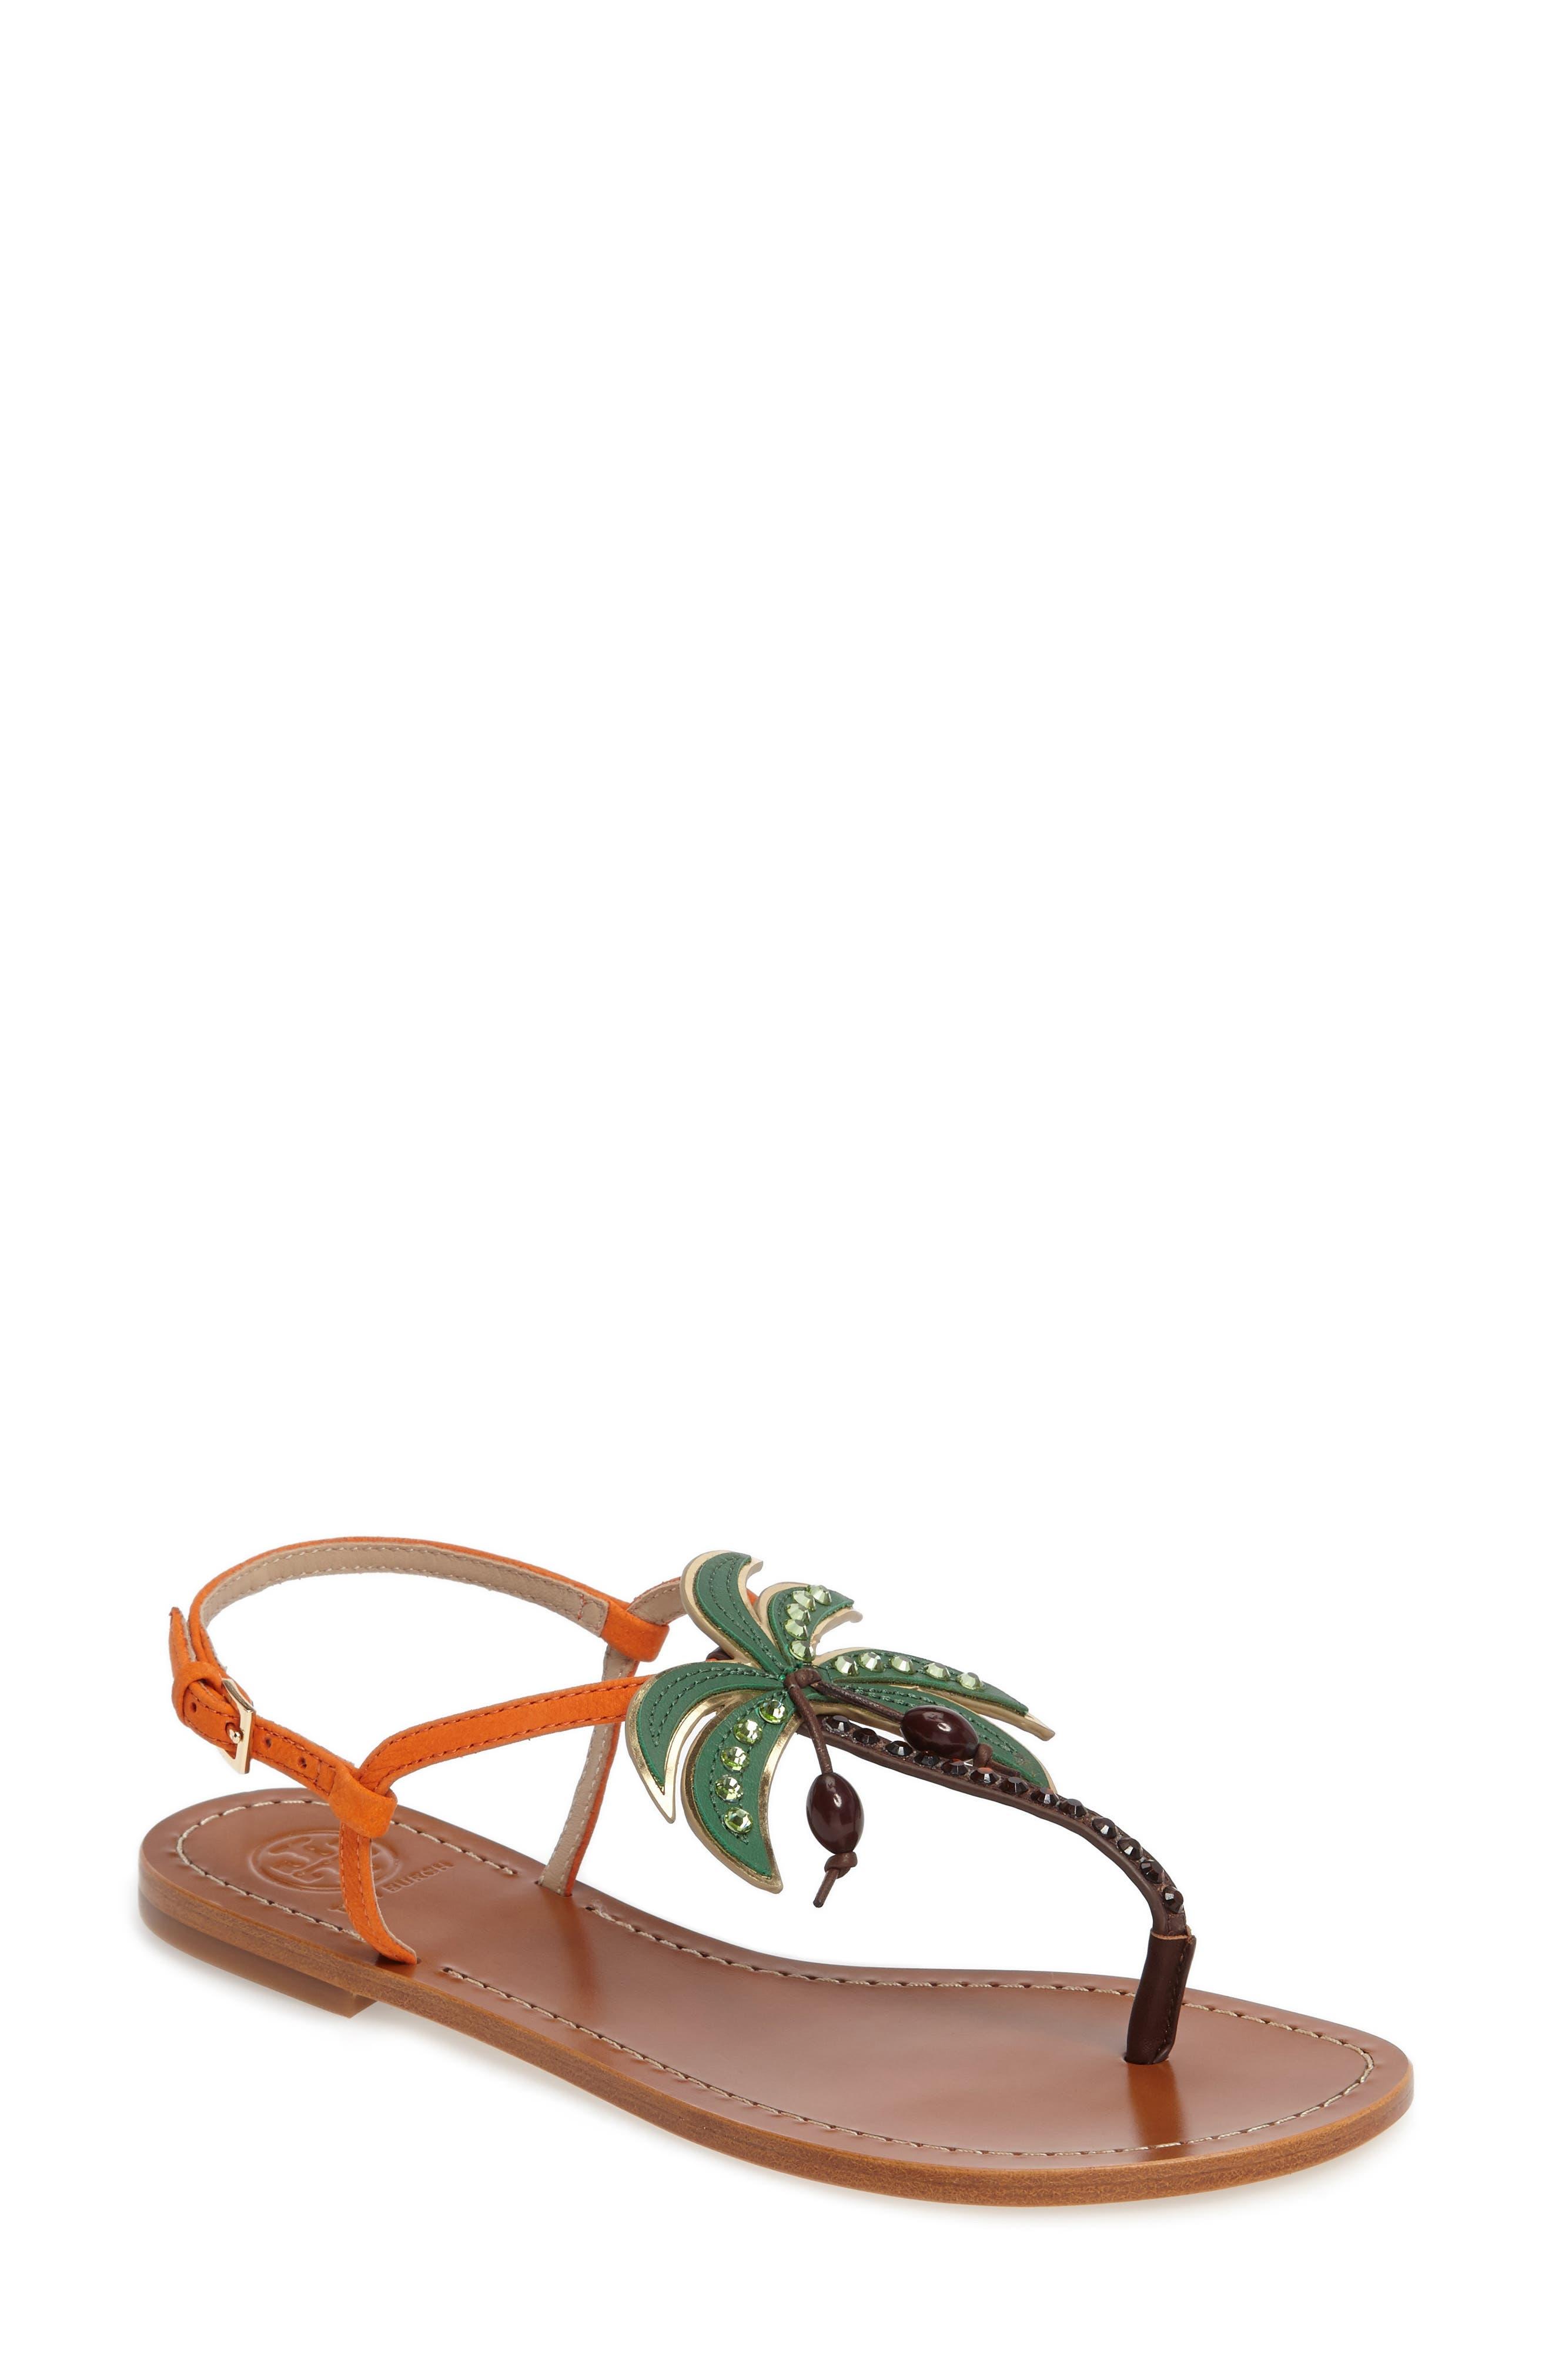 Alternate Image 1 Selected - Tory Burch Castaway Embellished Palm Tree Sandal (Women)